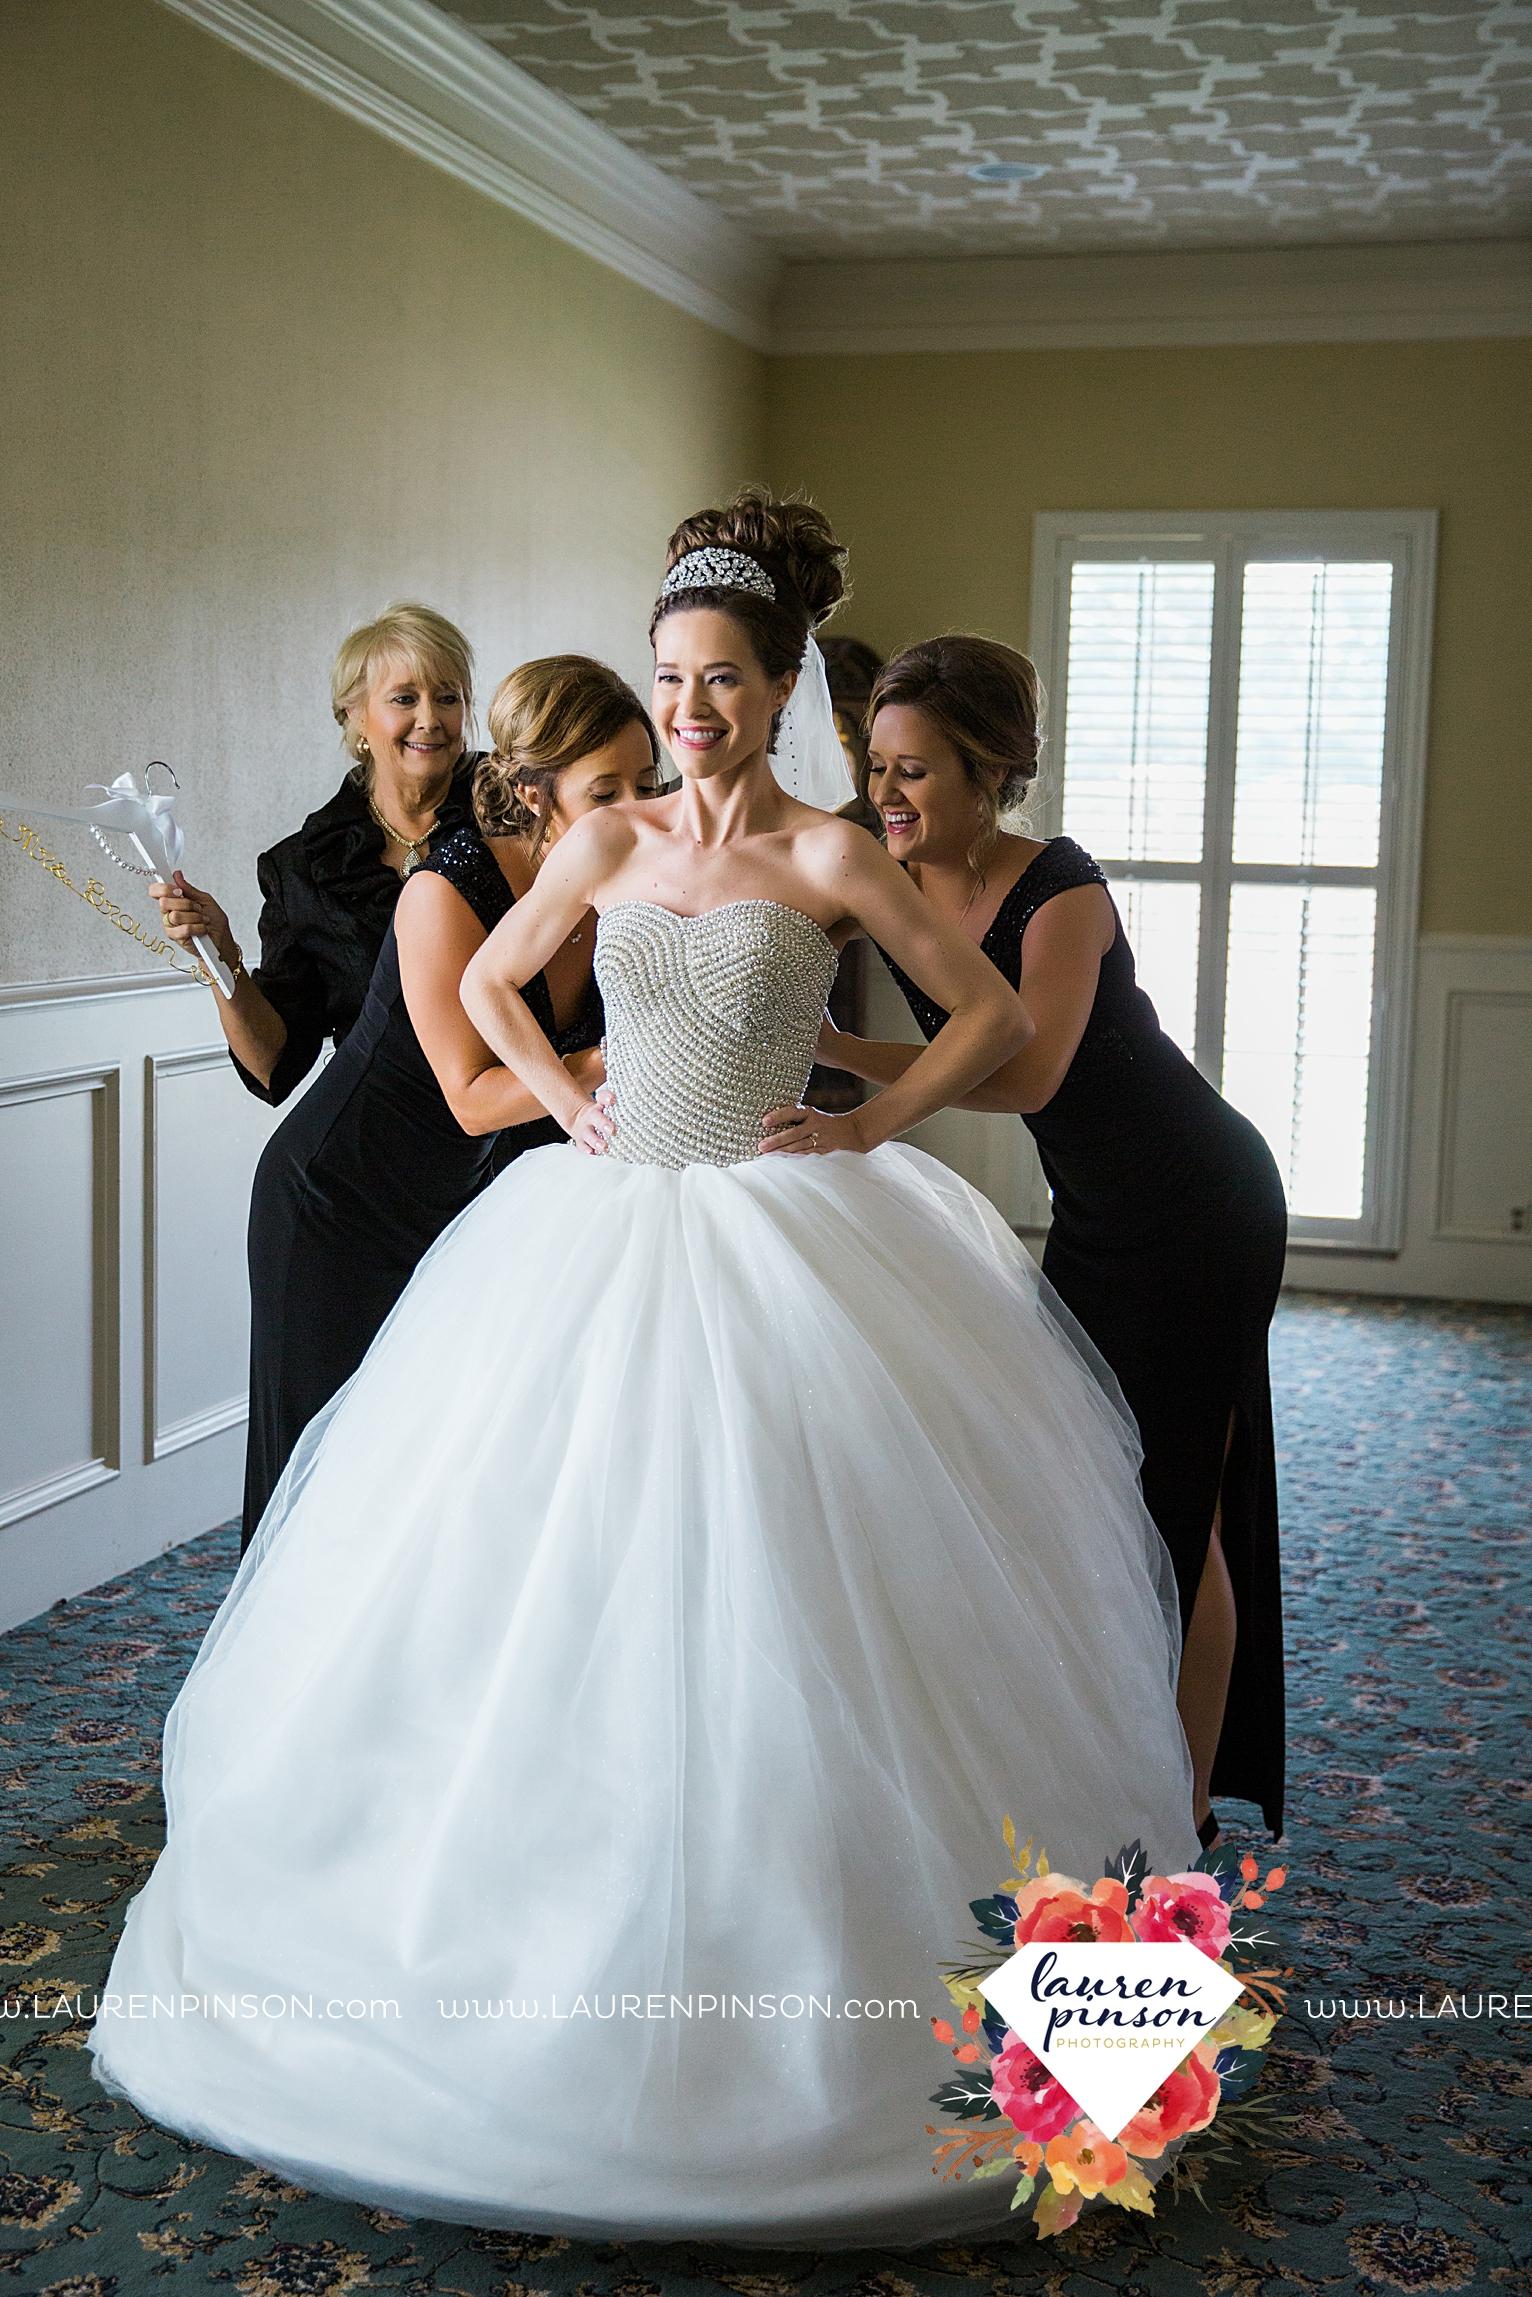 wichita-falls-texas-wedding-photographer-the-forum-by-the-kemp-mayfield-events-ulta-gold-glitter_2810.jpg